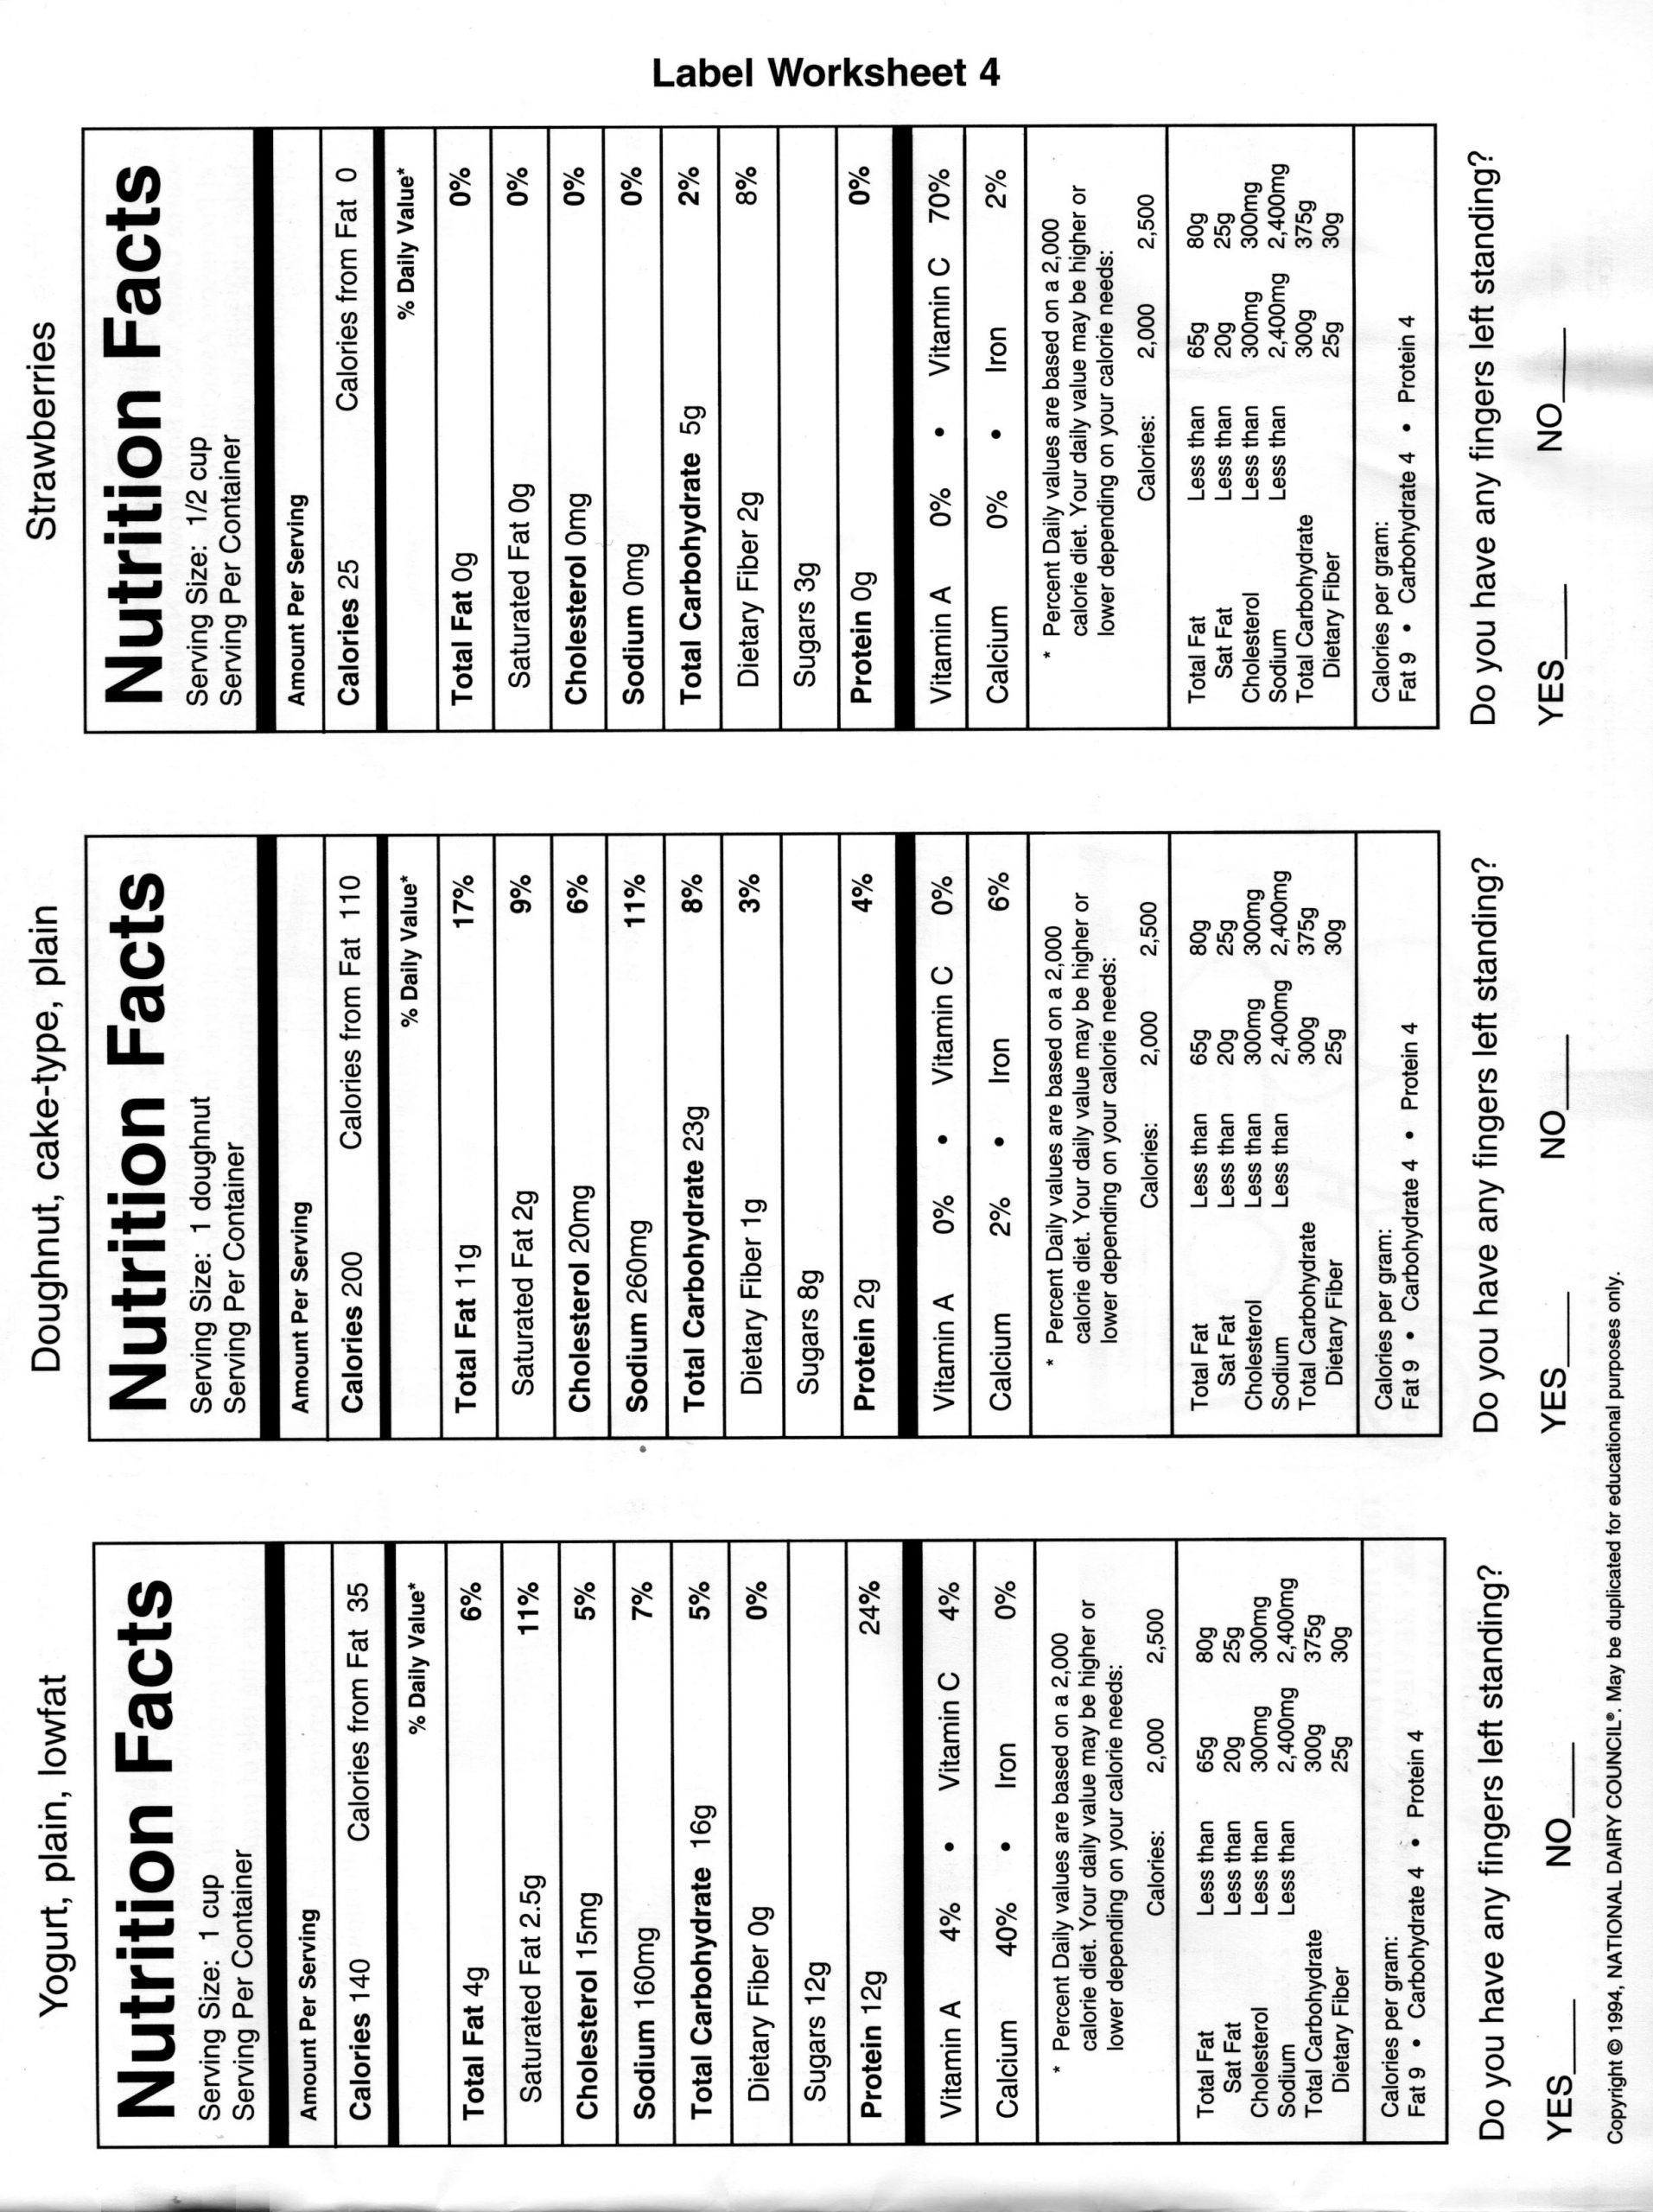 Reading Food Label Worksheet Nutrition Label Worksheet Key Ythoreccio